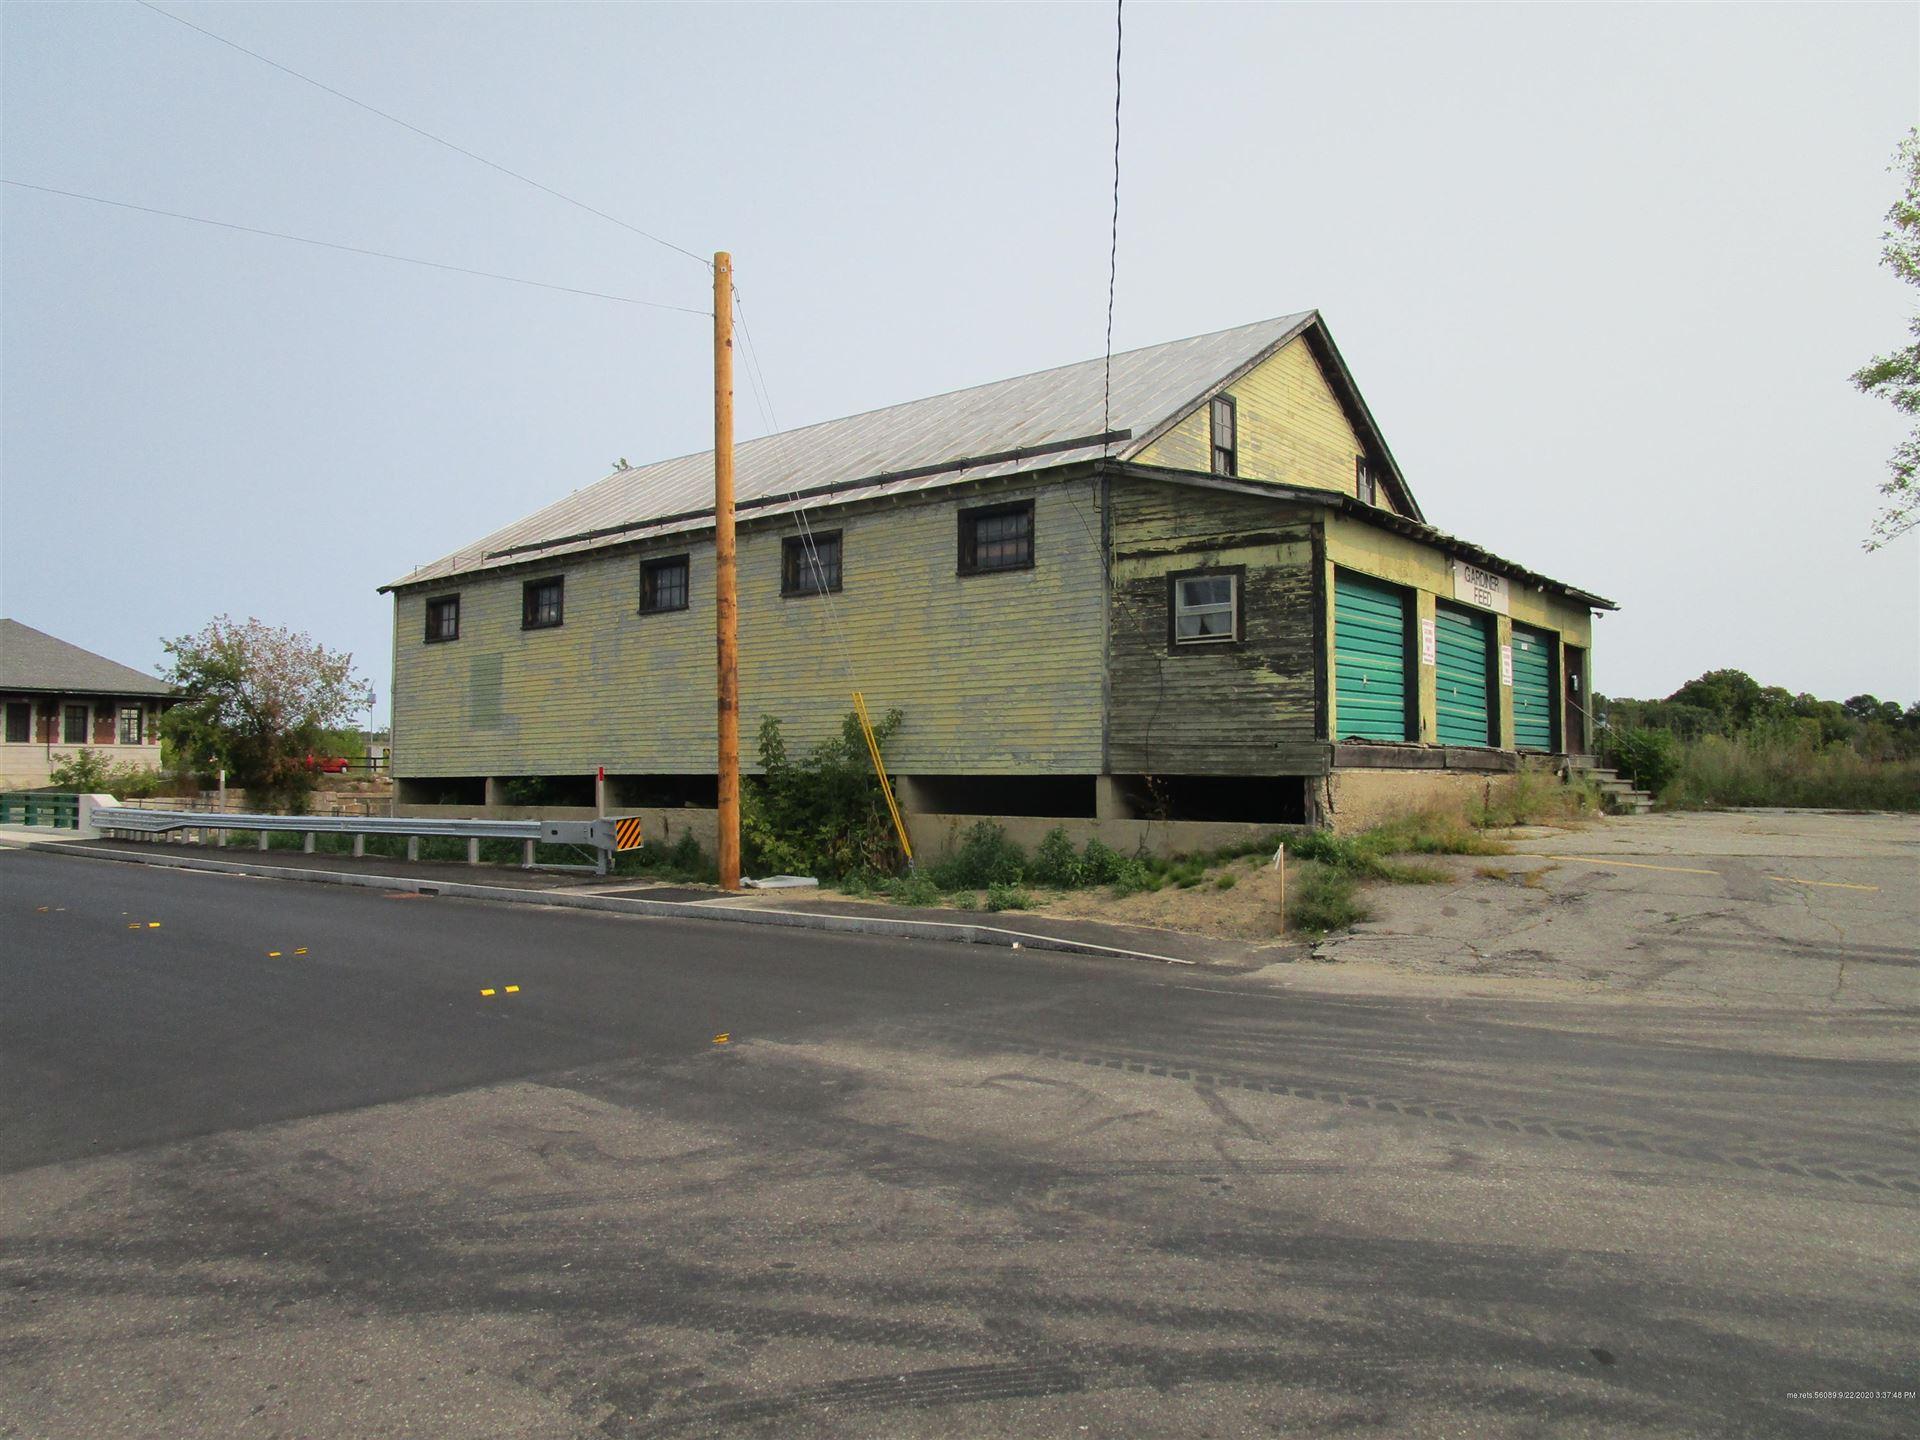 Photo of 19 Main Avenue, Gardiner, ME 04345 (MLS # 1469746)